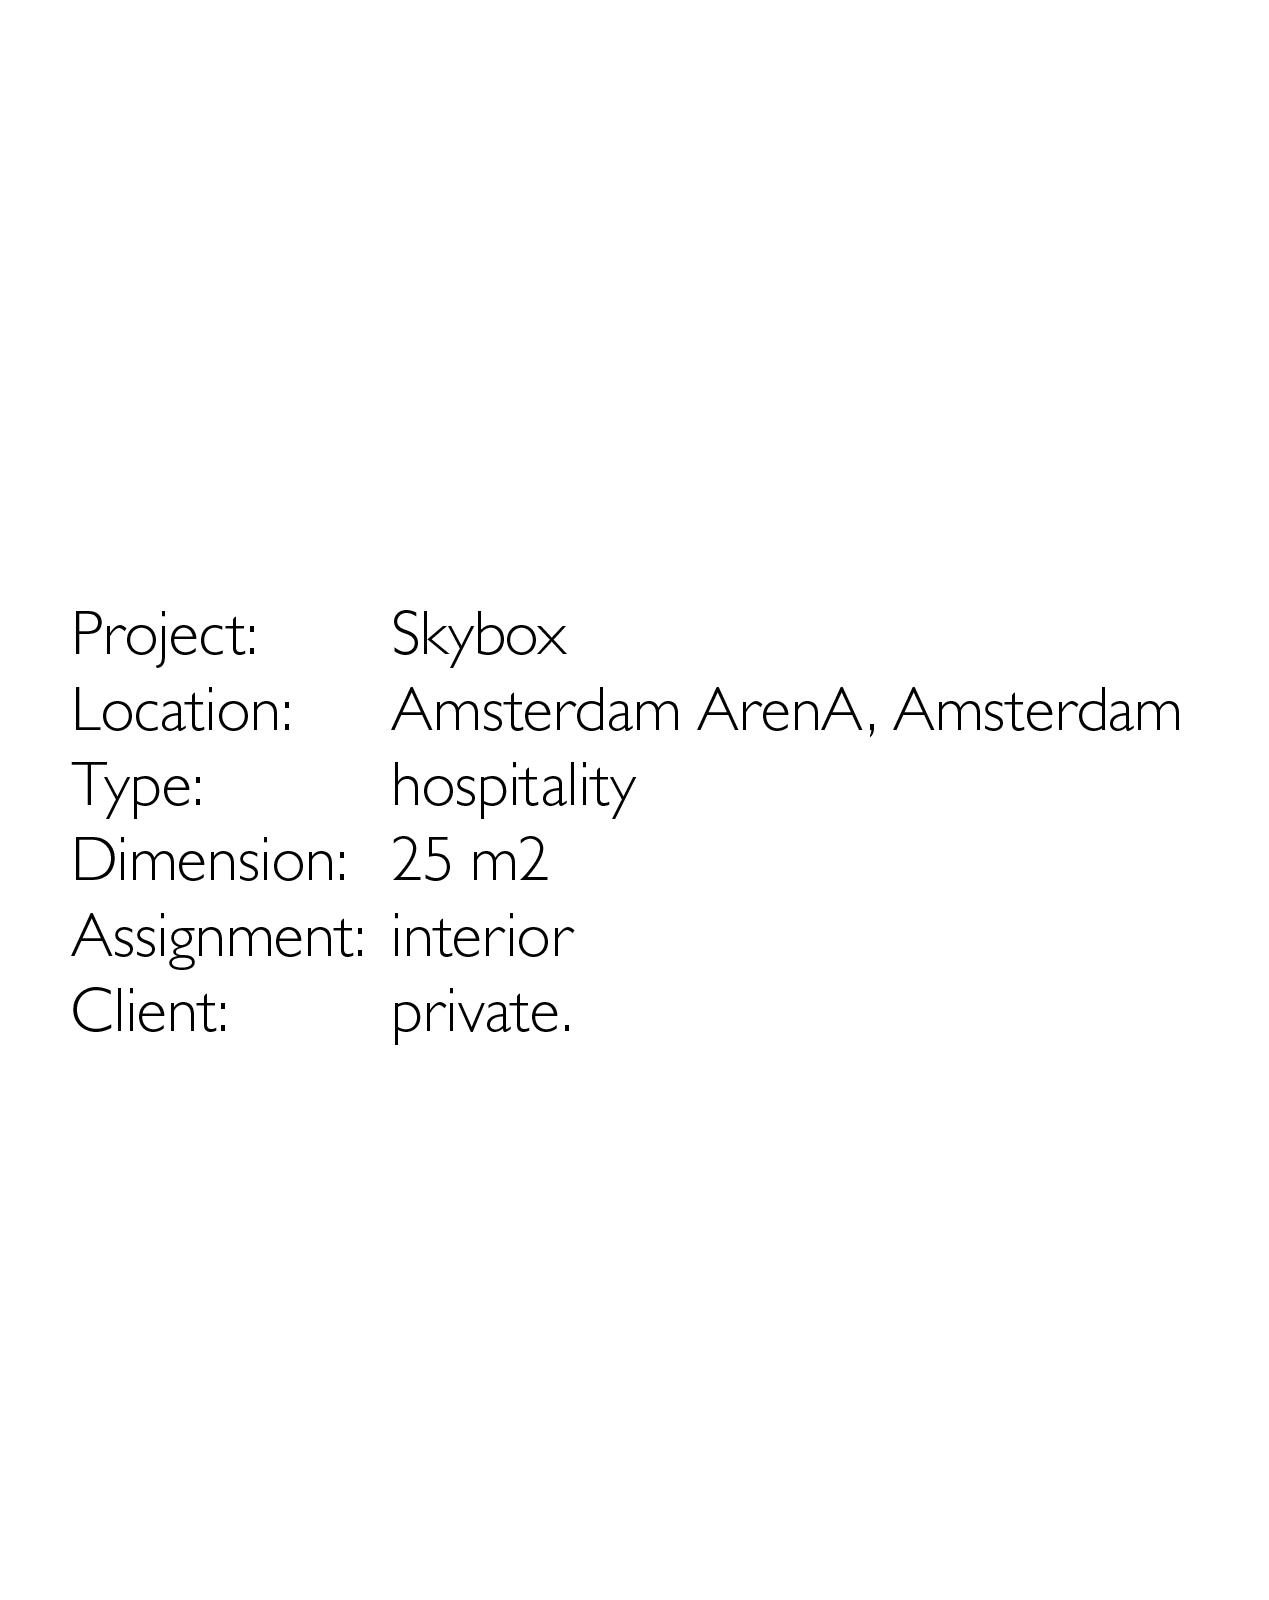 jeroendenijs_arena_skybox_projectinfo_adidas_ajax